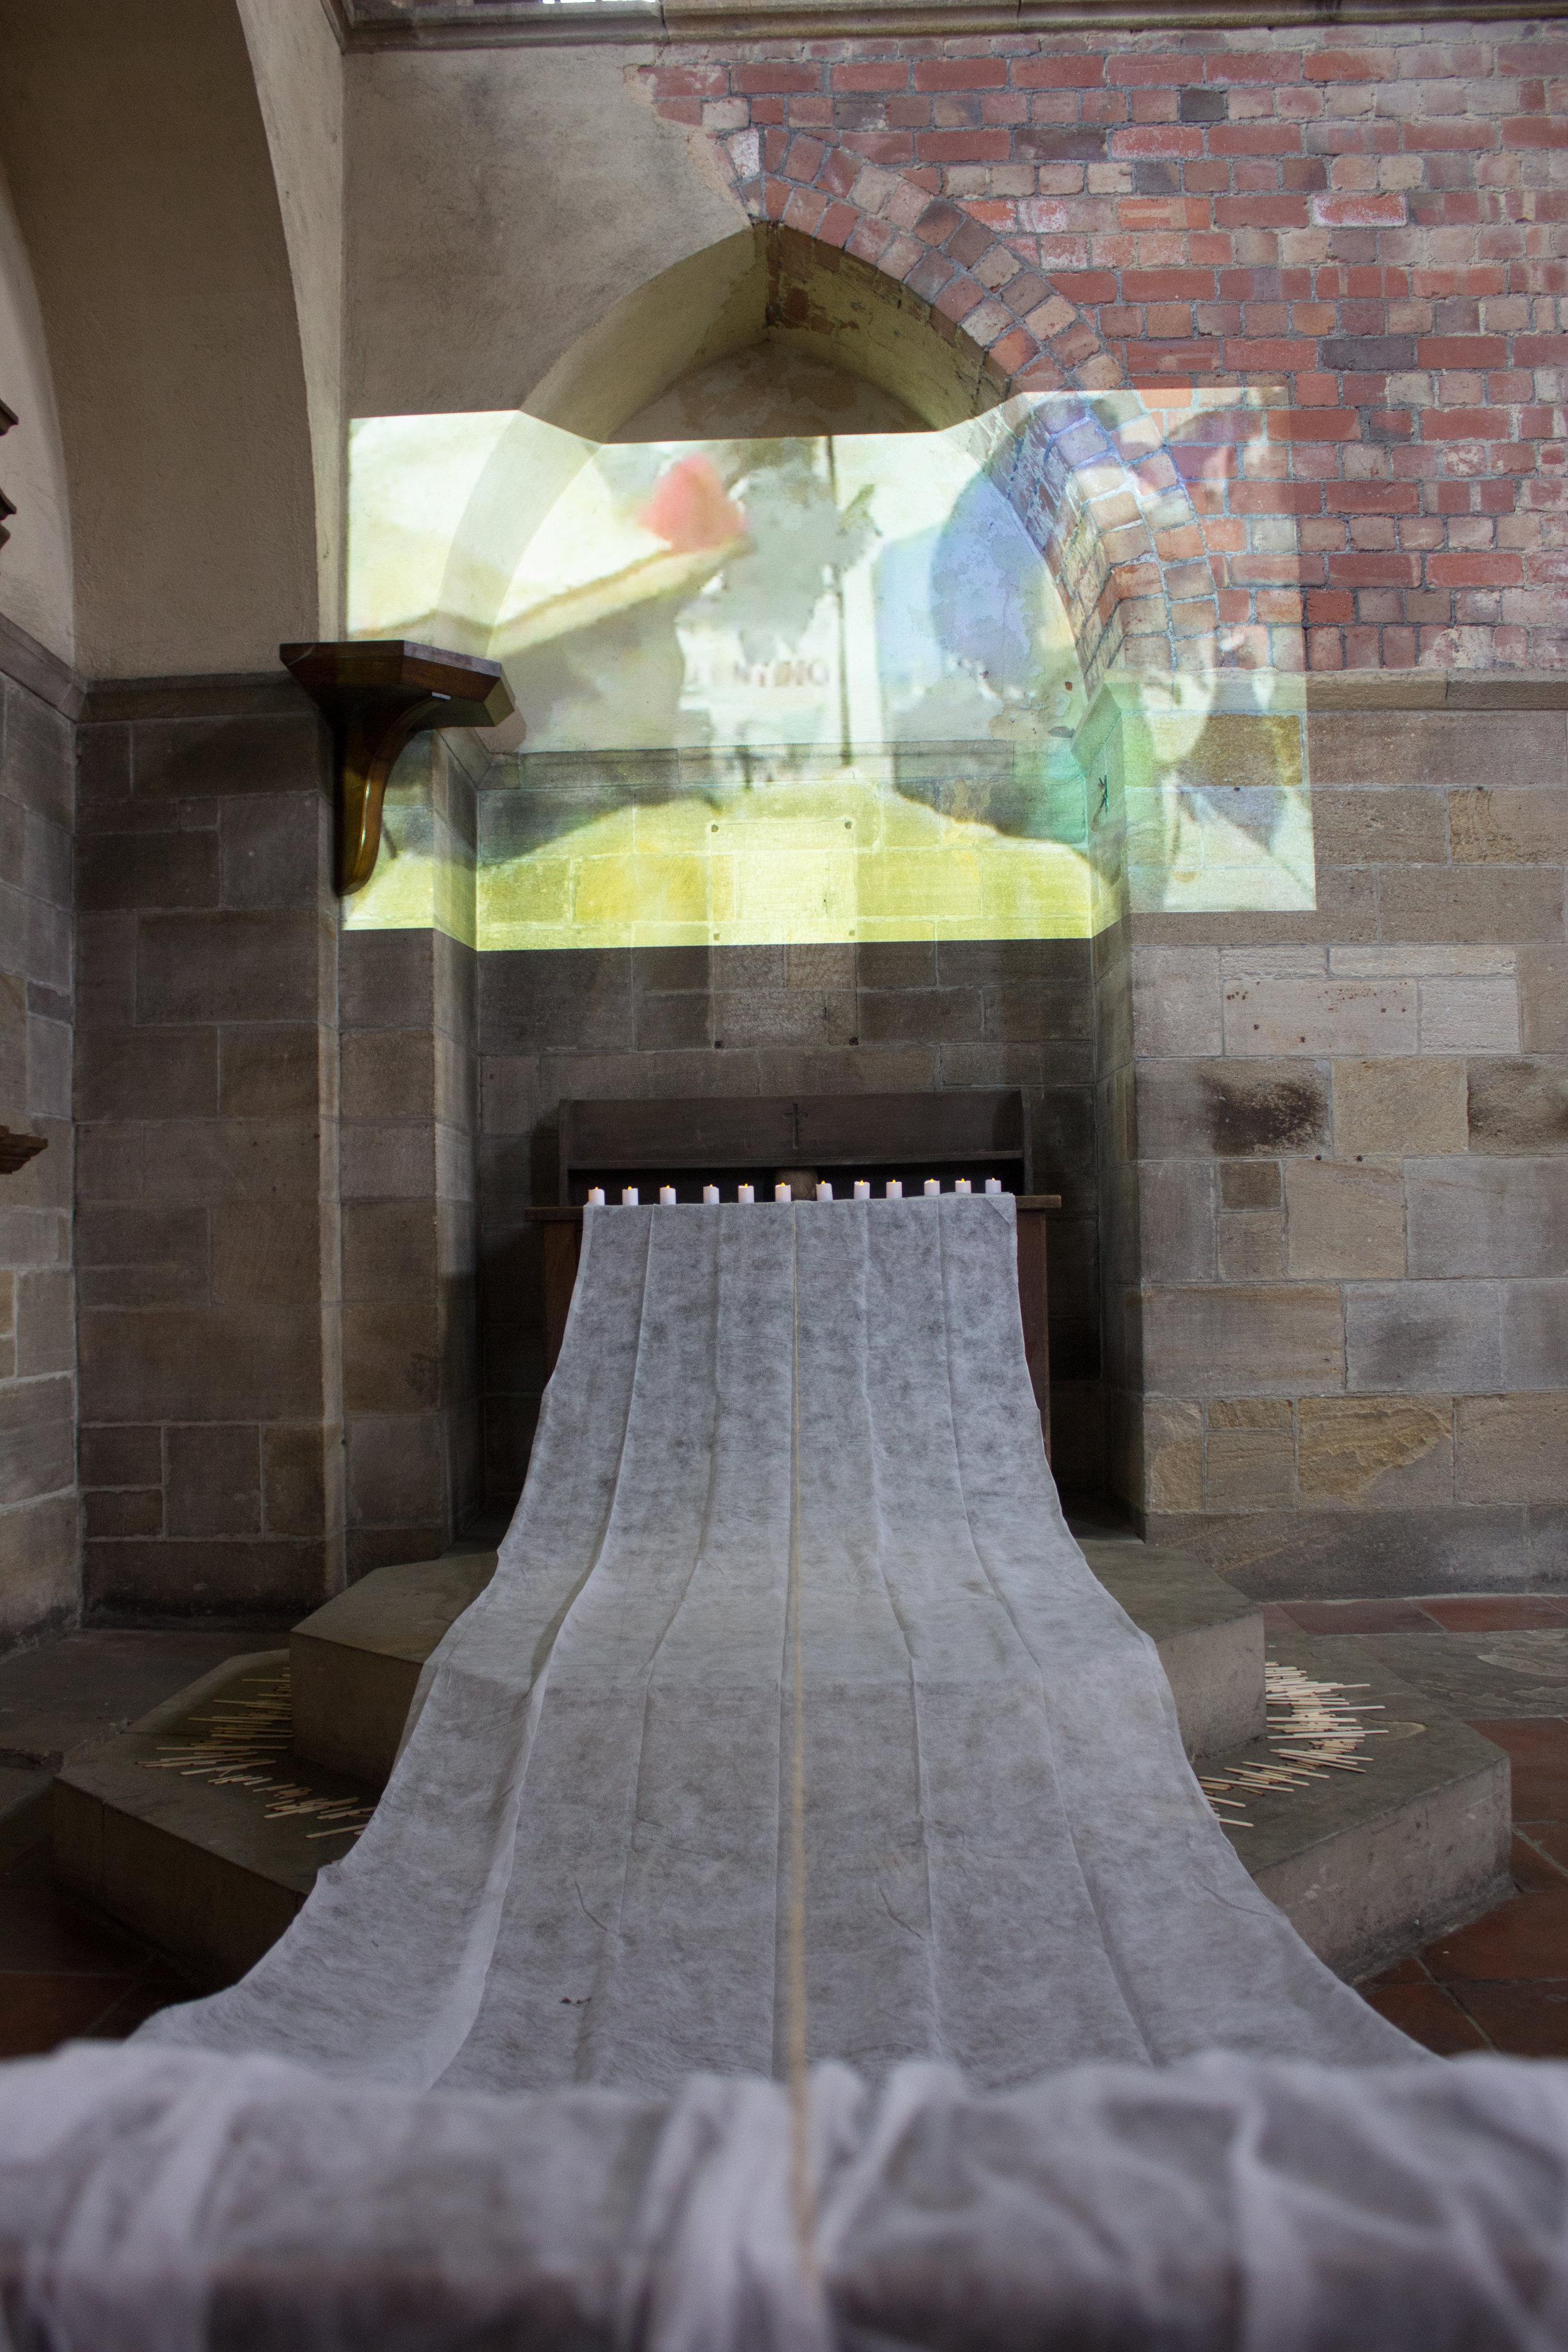 malay/taos/rp/pi (2017) installation at Left Bank Leeds